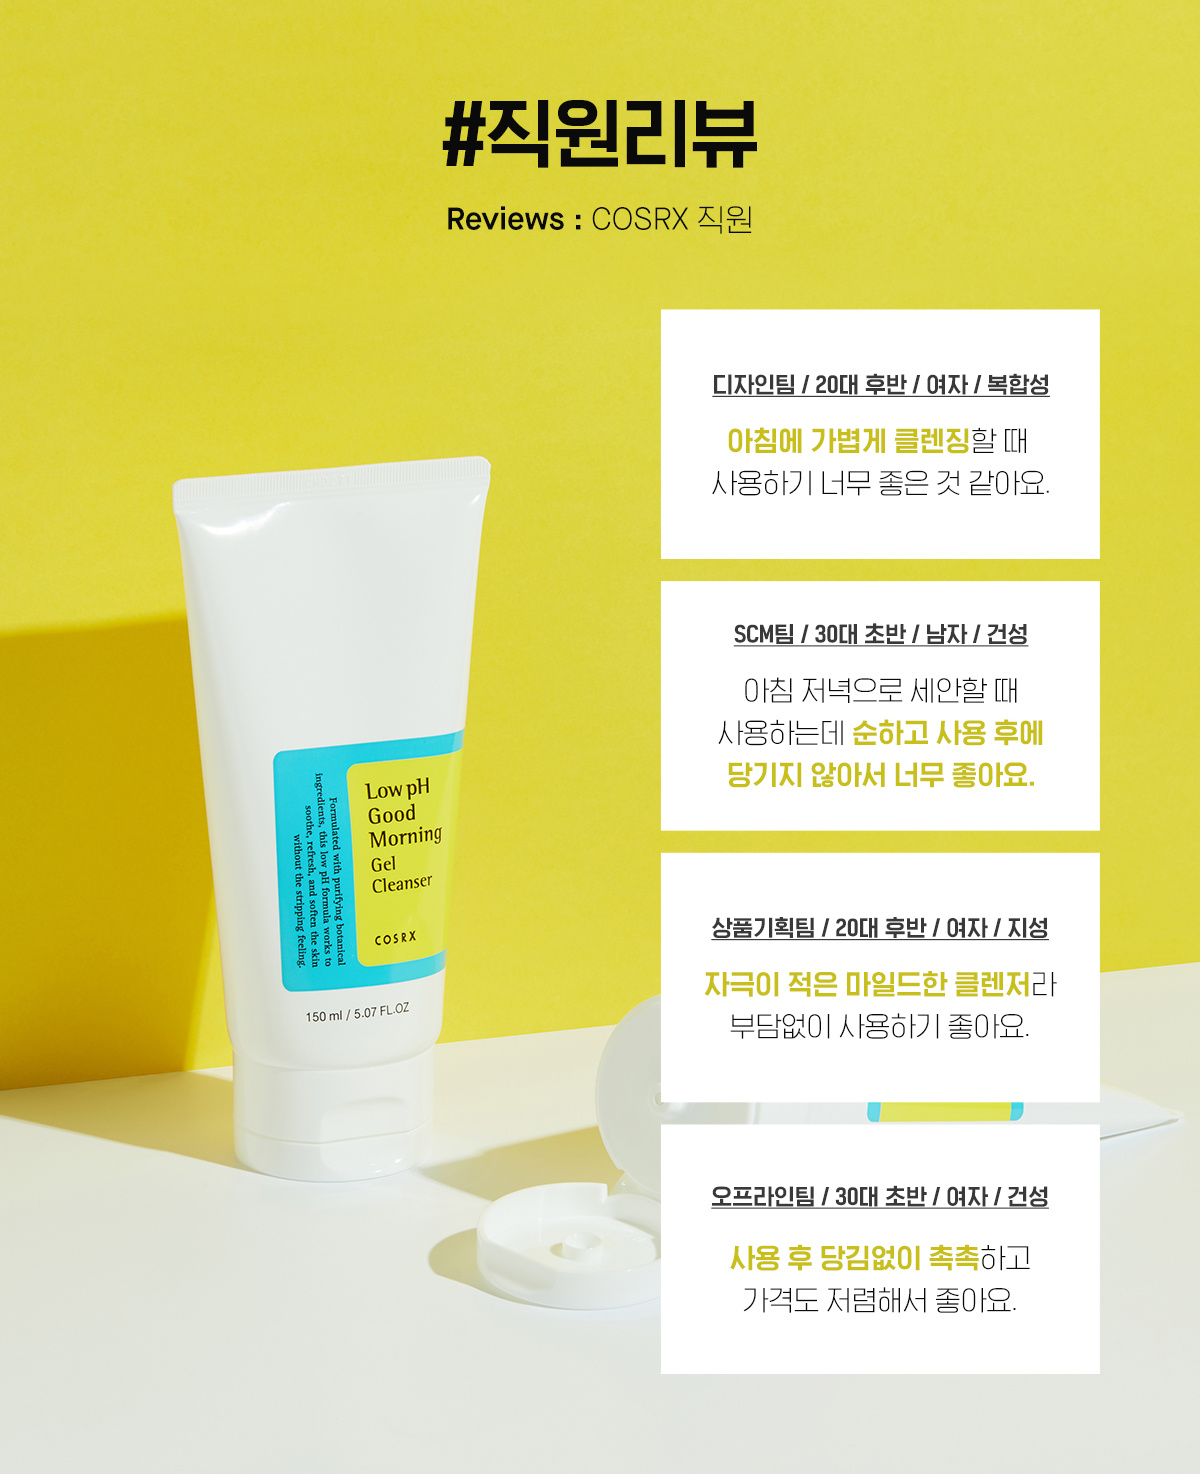 Low pH Good Morning Gel Cleanser-5